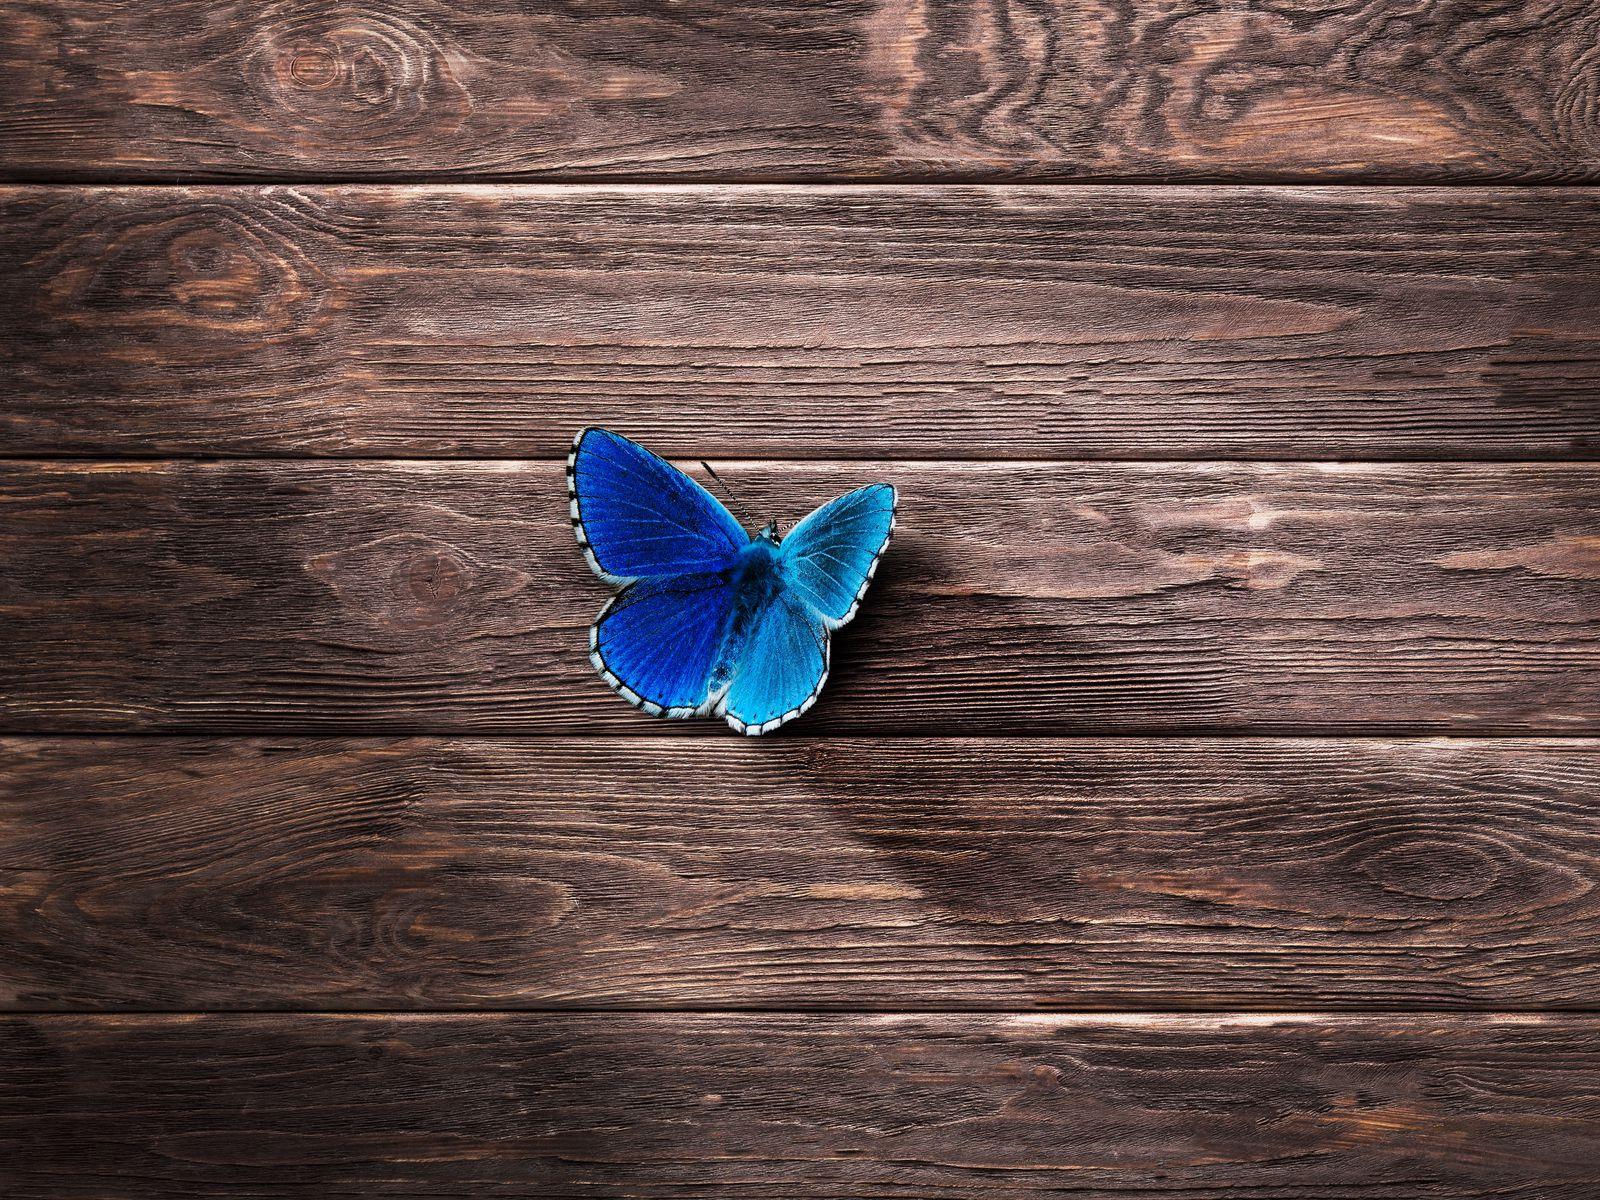 1600x1200 Wallpaper butterfly, surface, wooden